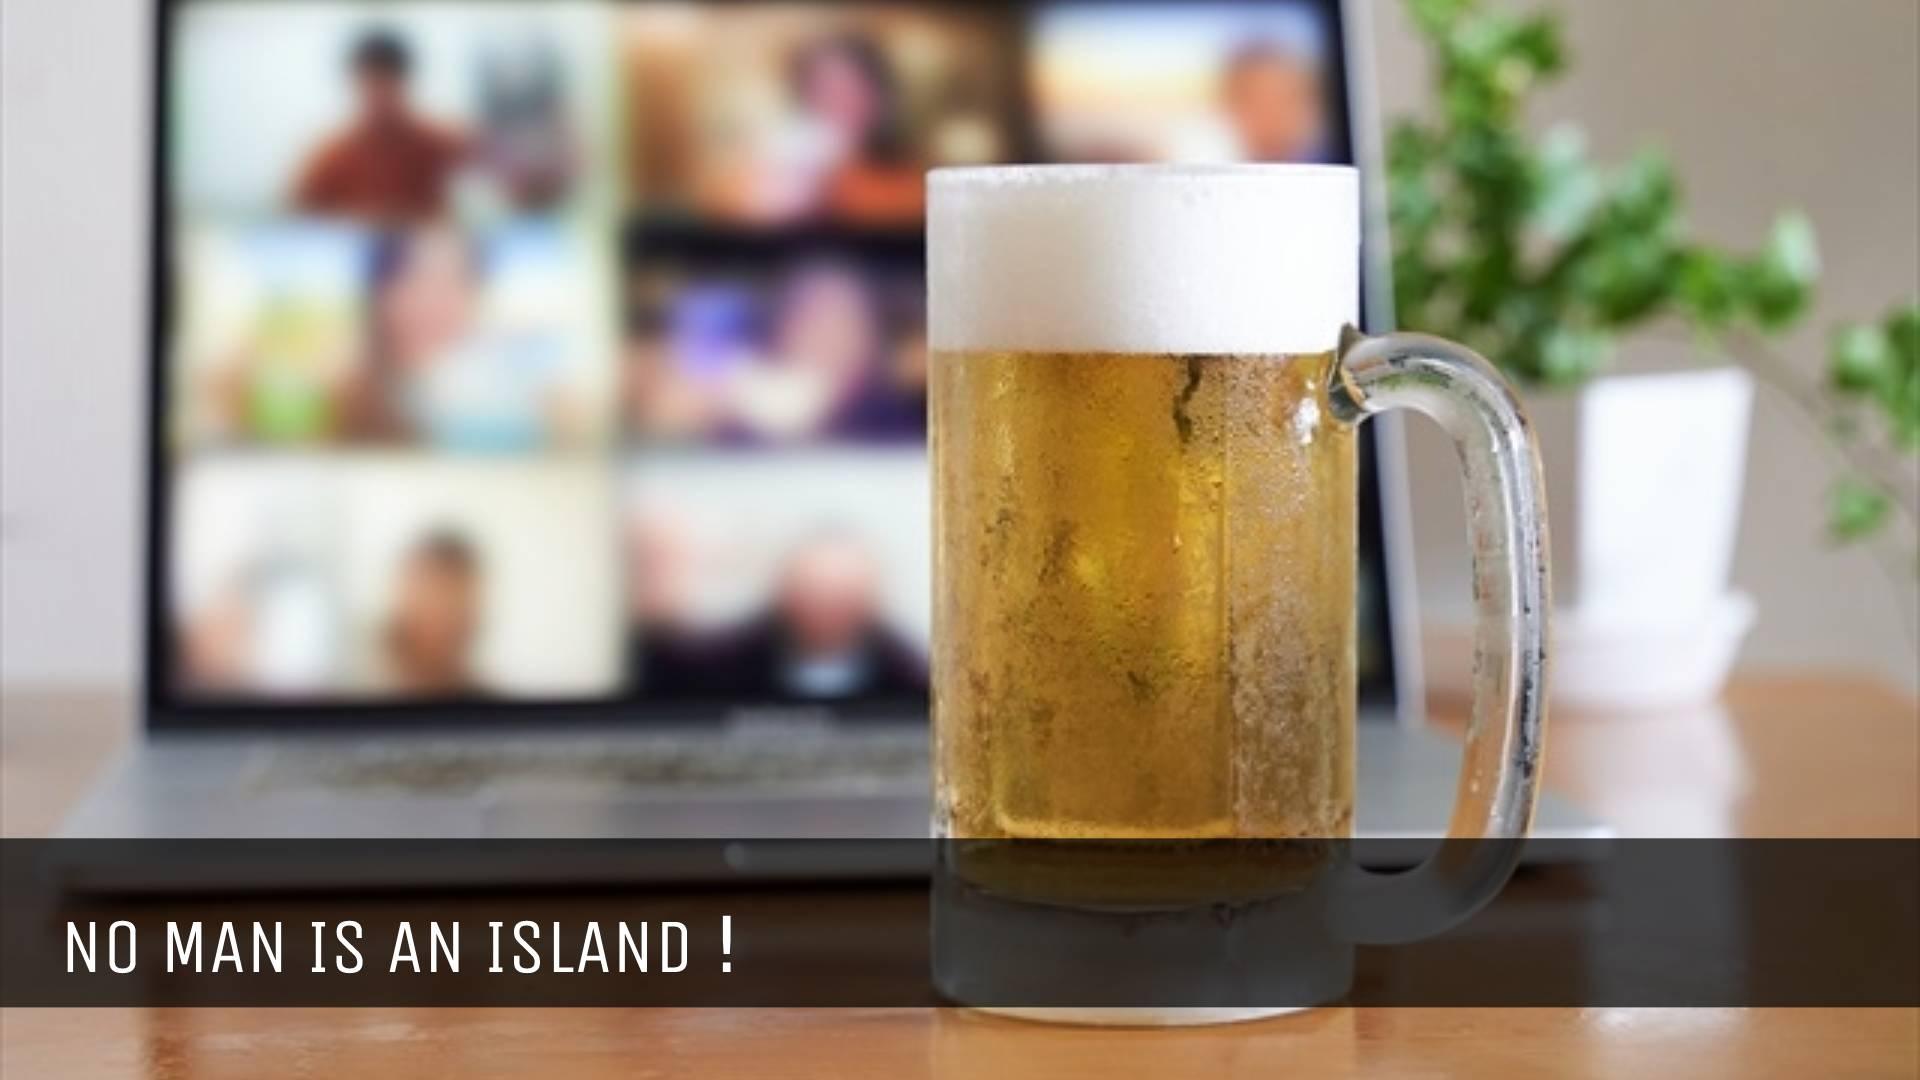 NO MAN IS AN ISLAND !